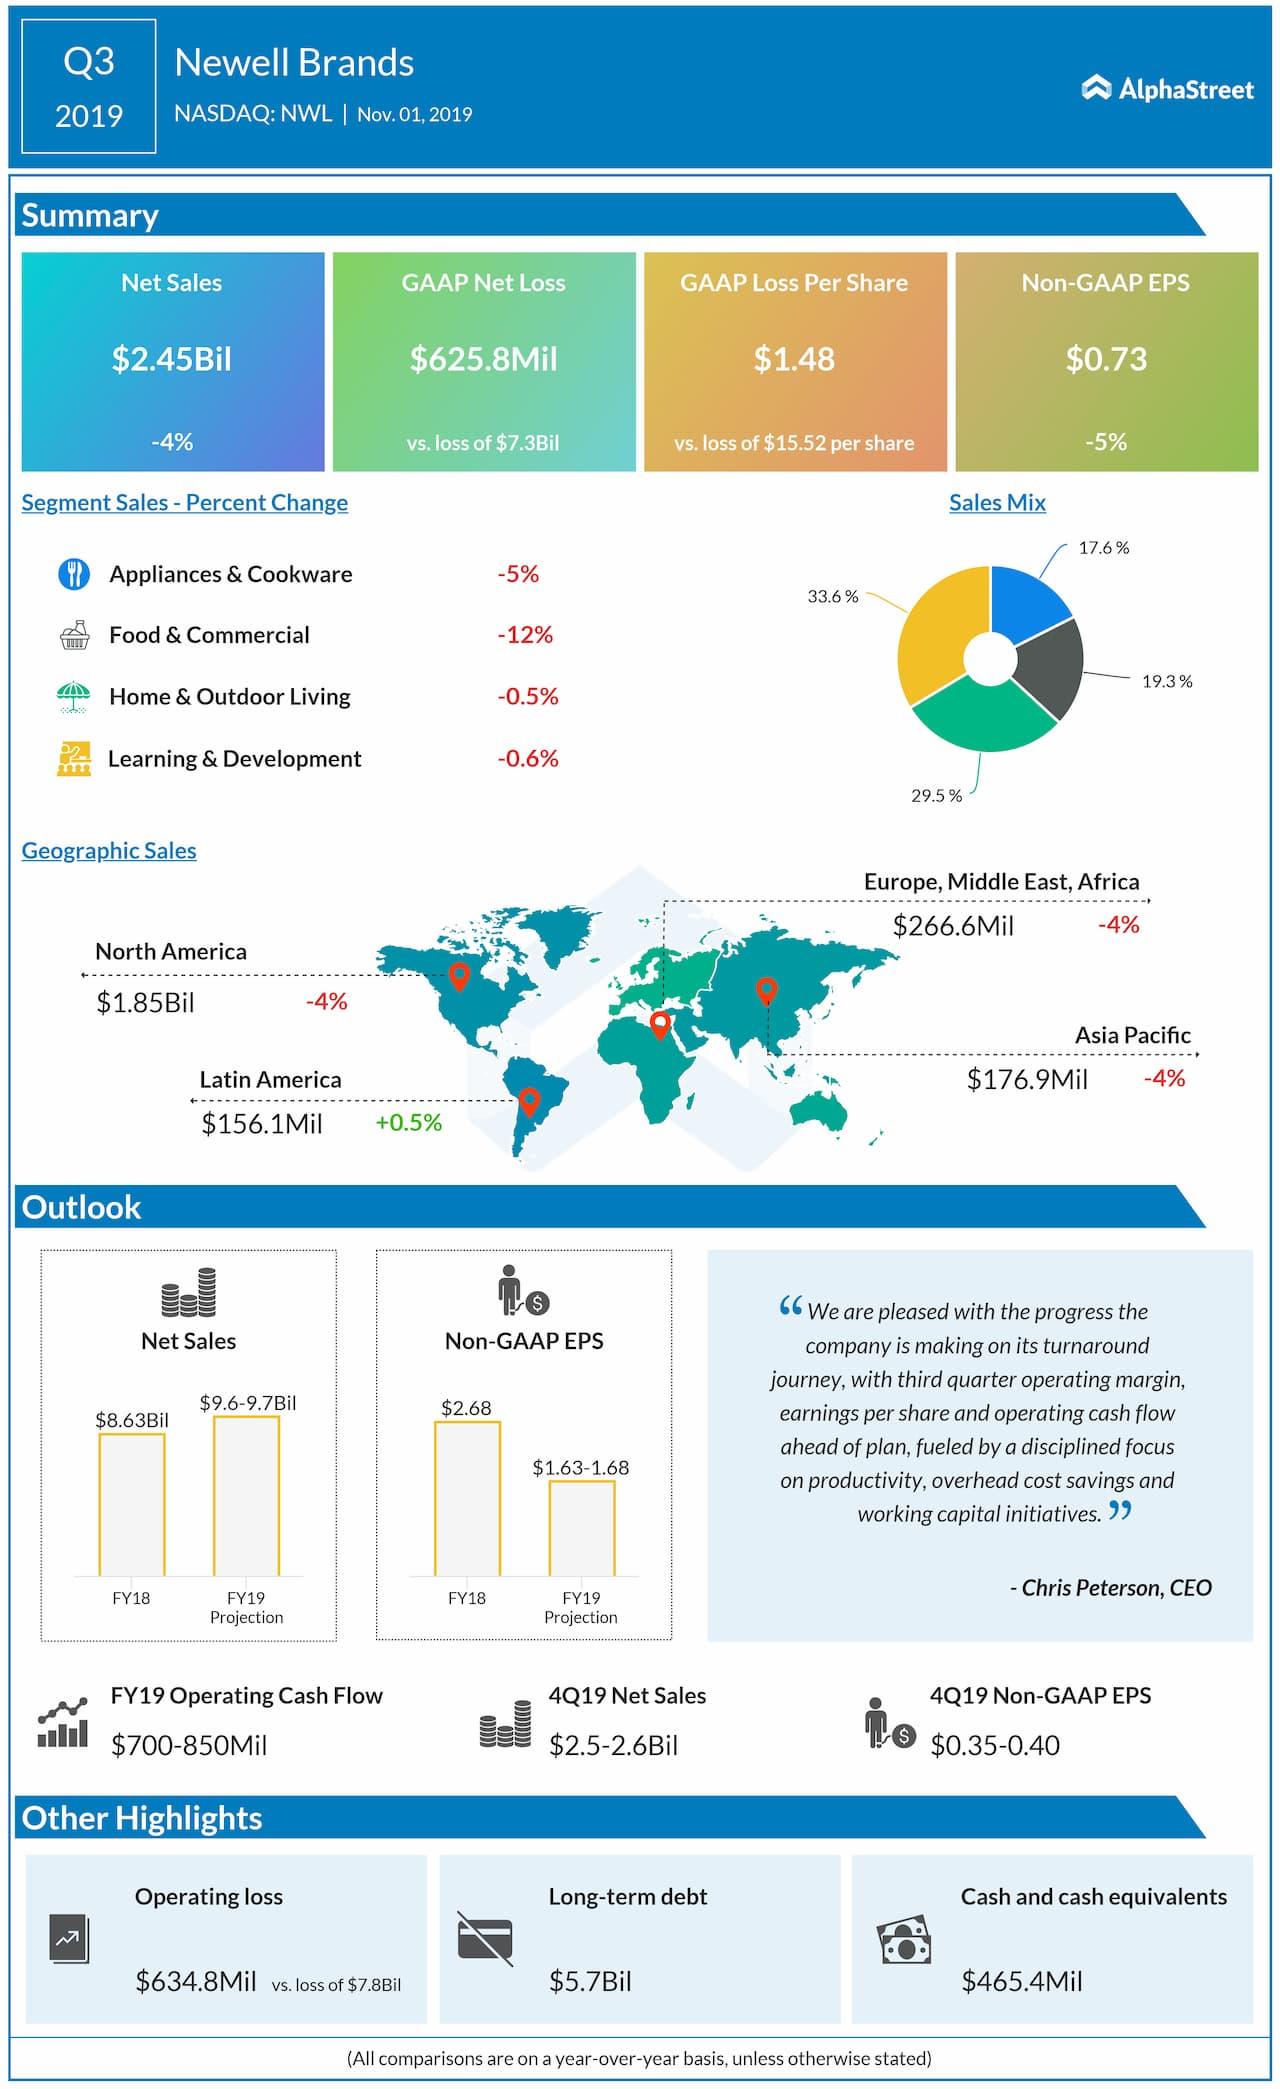 Newell Brands (NASDAQ: NWL) Q3 2019 Earnings Snapshot